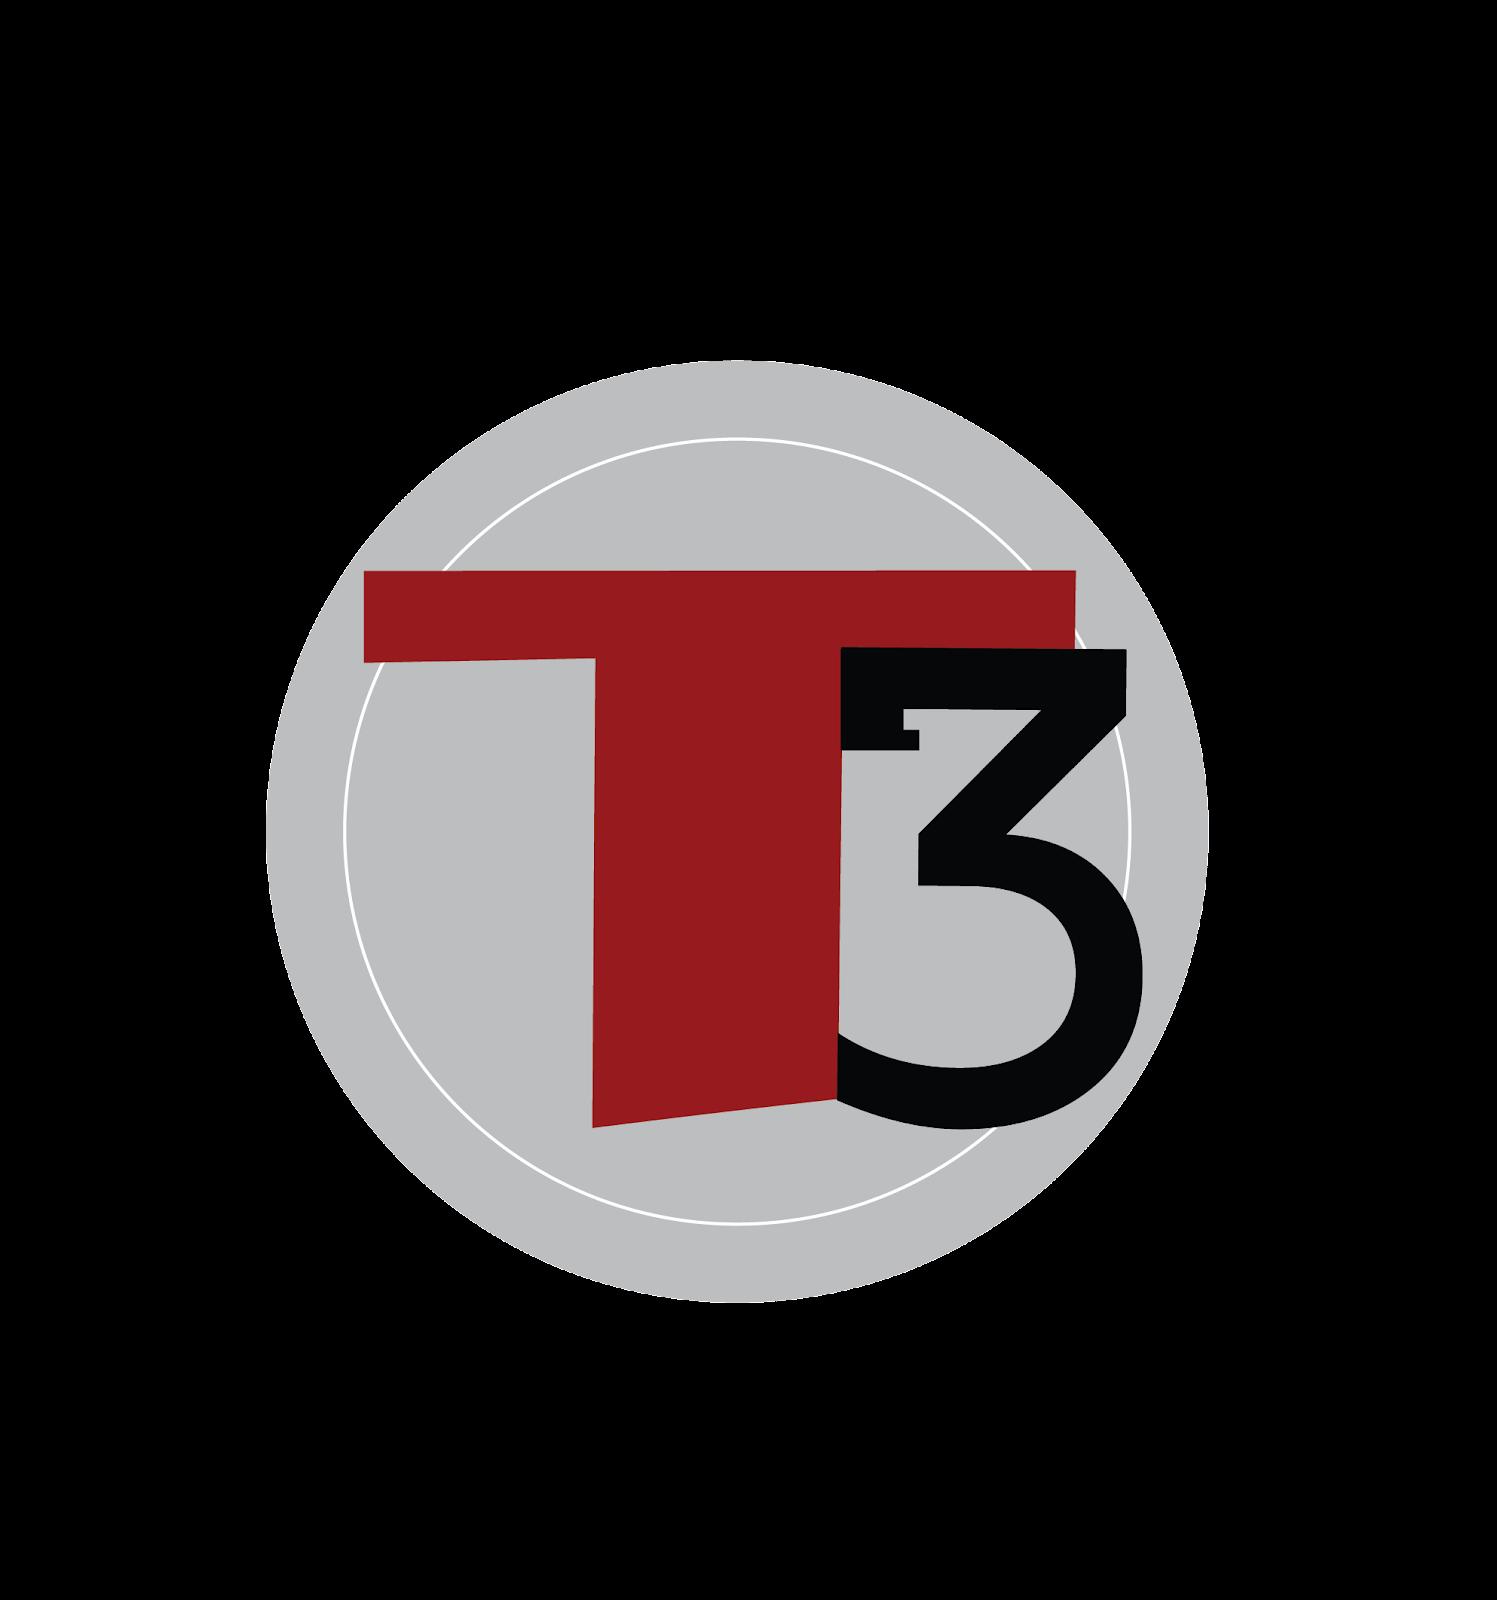 T3 Art Image.png